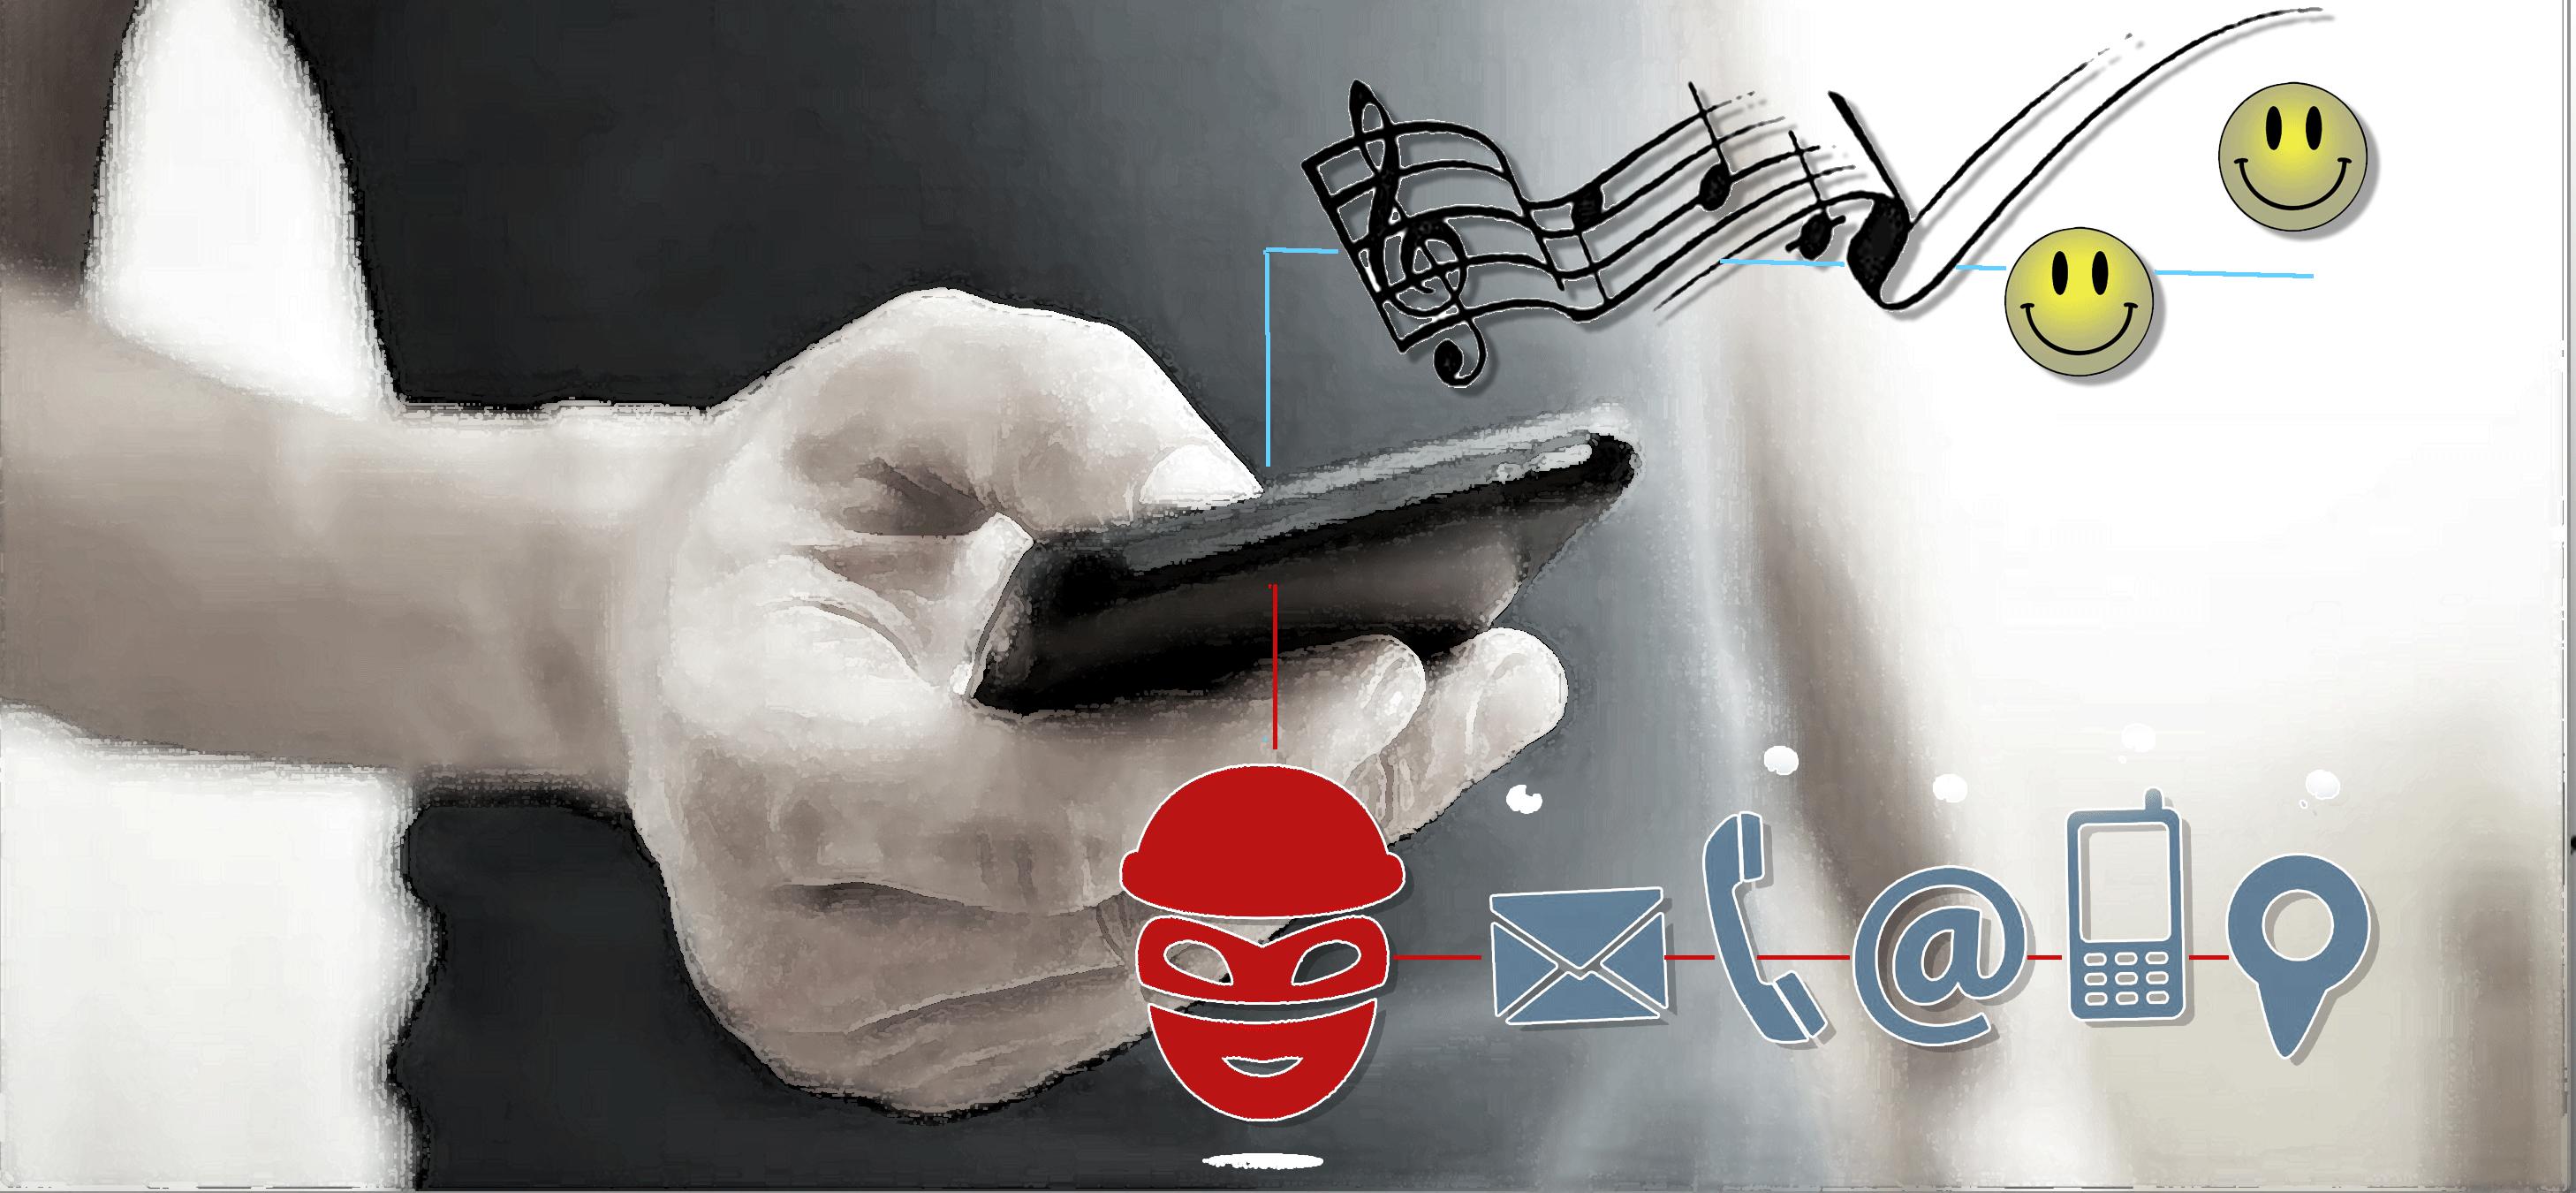 WhatsApp: attenzione a Chatwatch, l'app che spia VIDEO